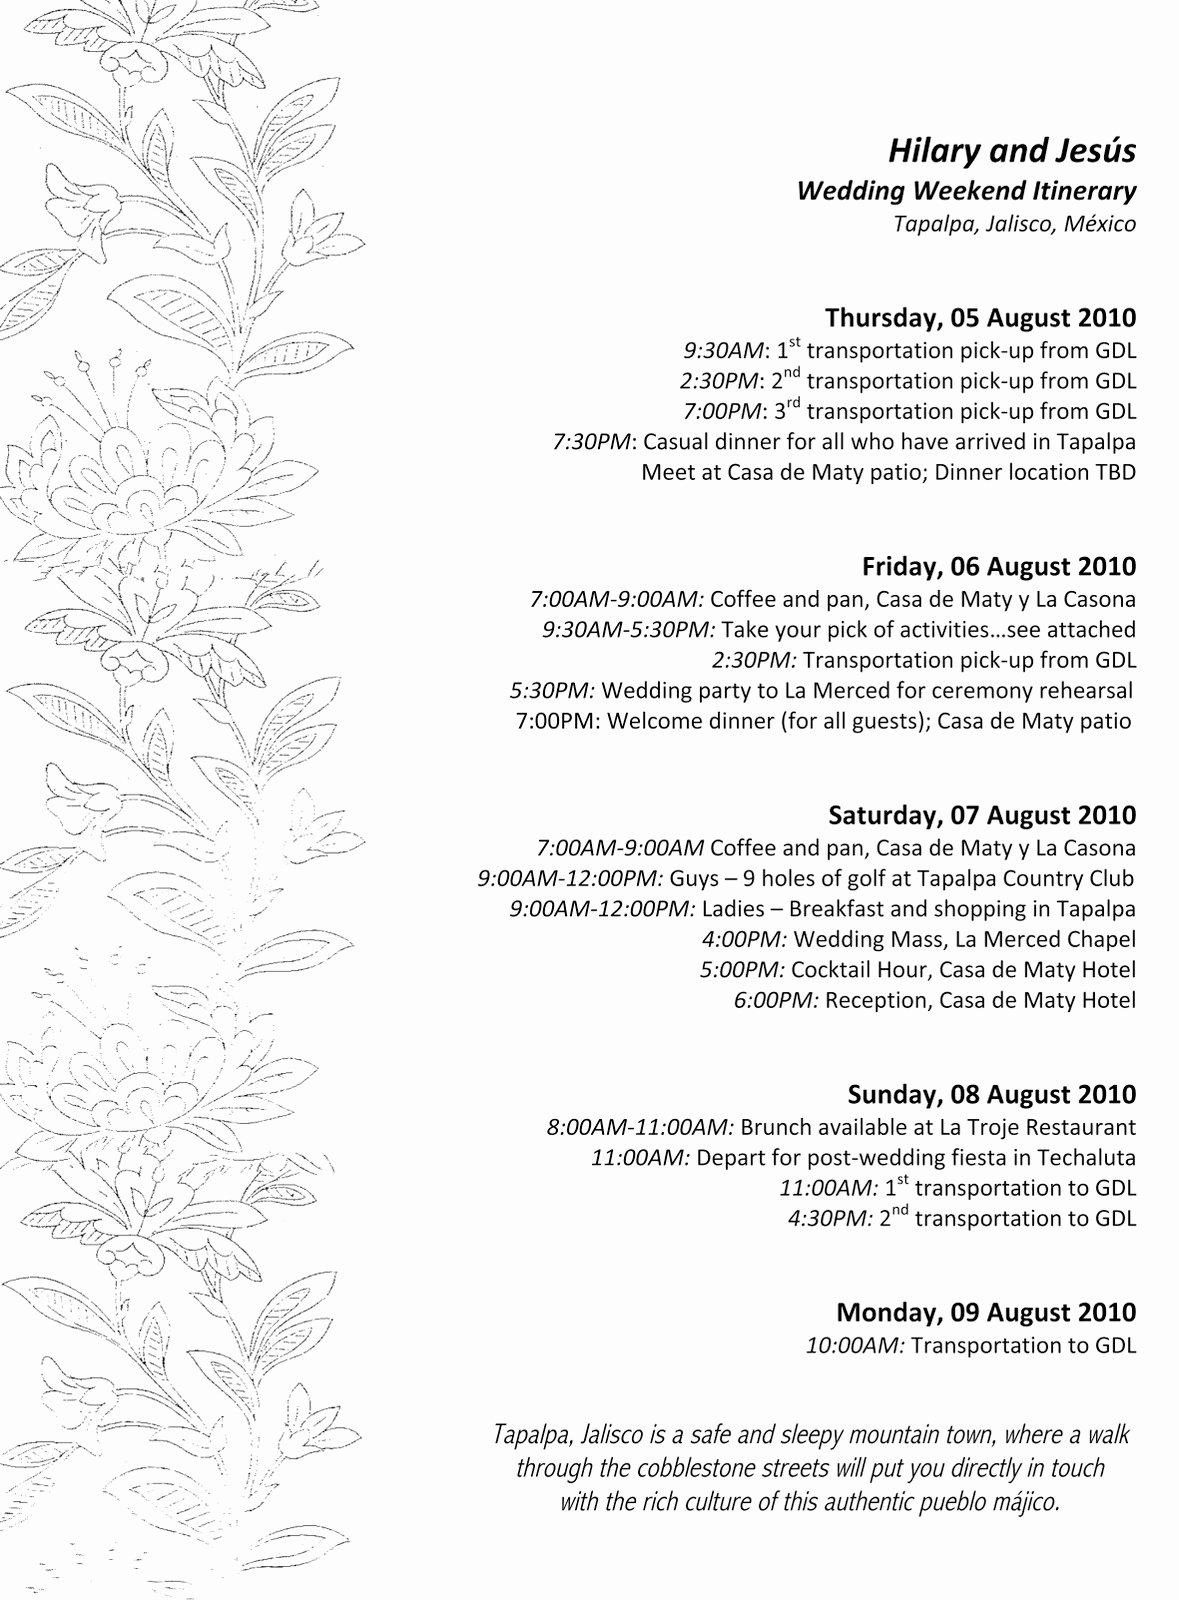 Wedding Weekend Itinerary Template Free Best Of Wedding Weekend Agenda Template Aholicutorrent